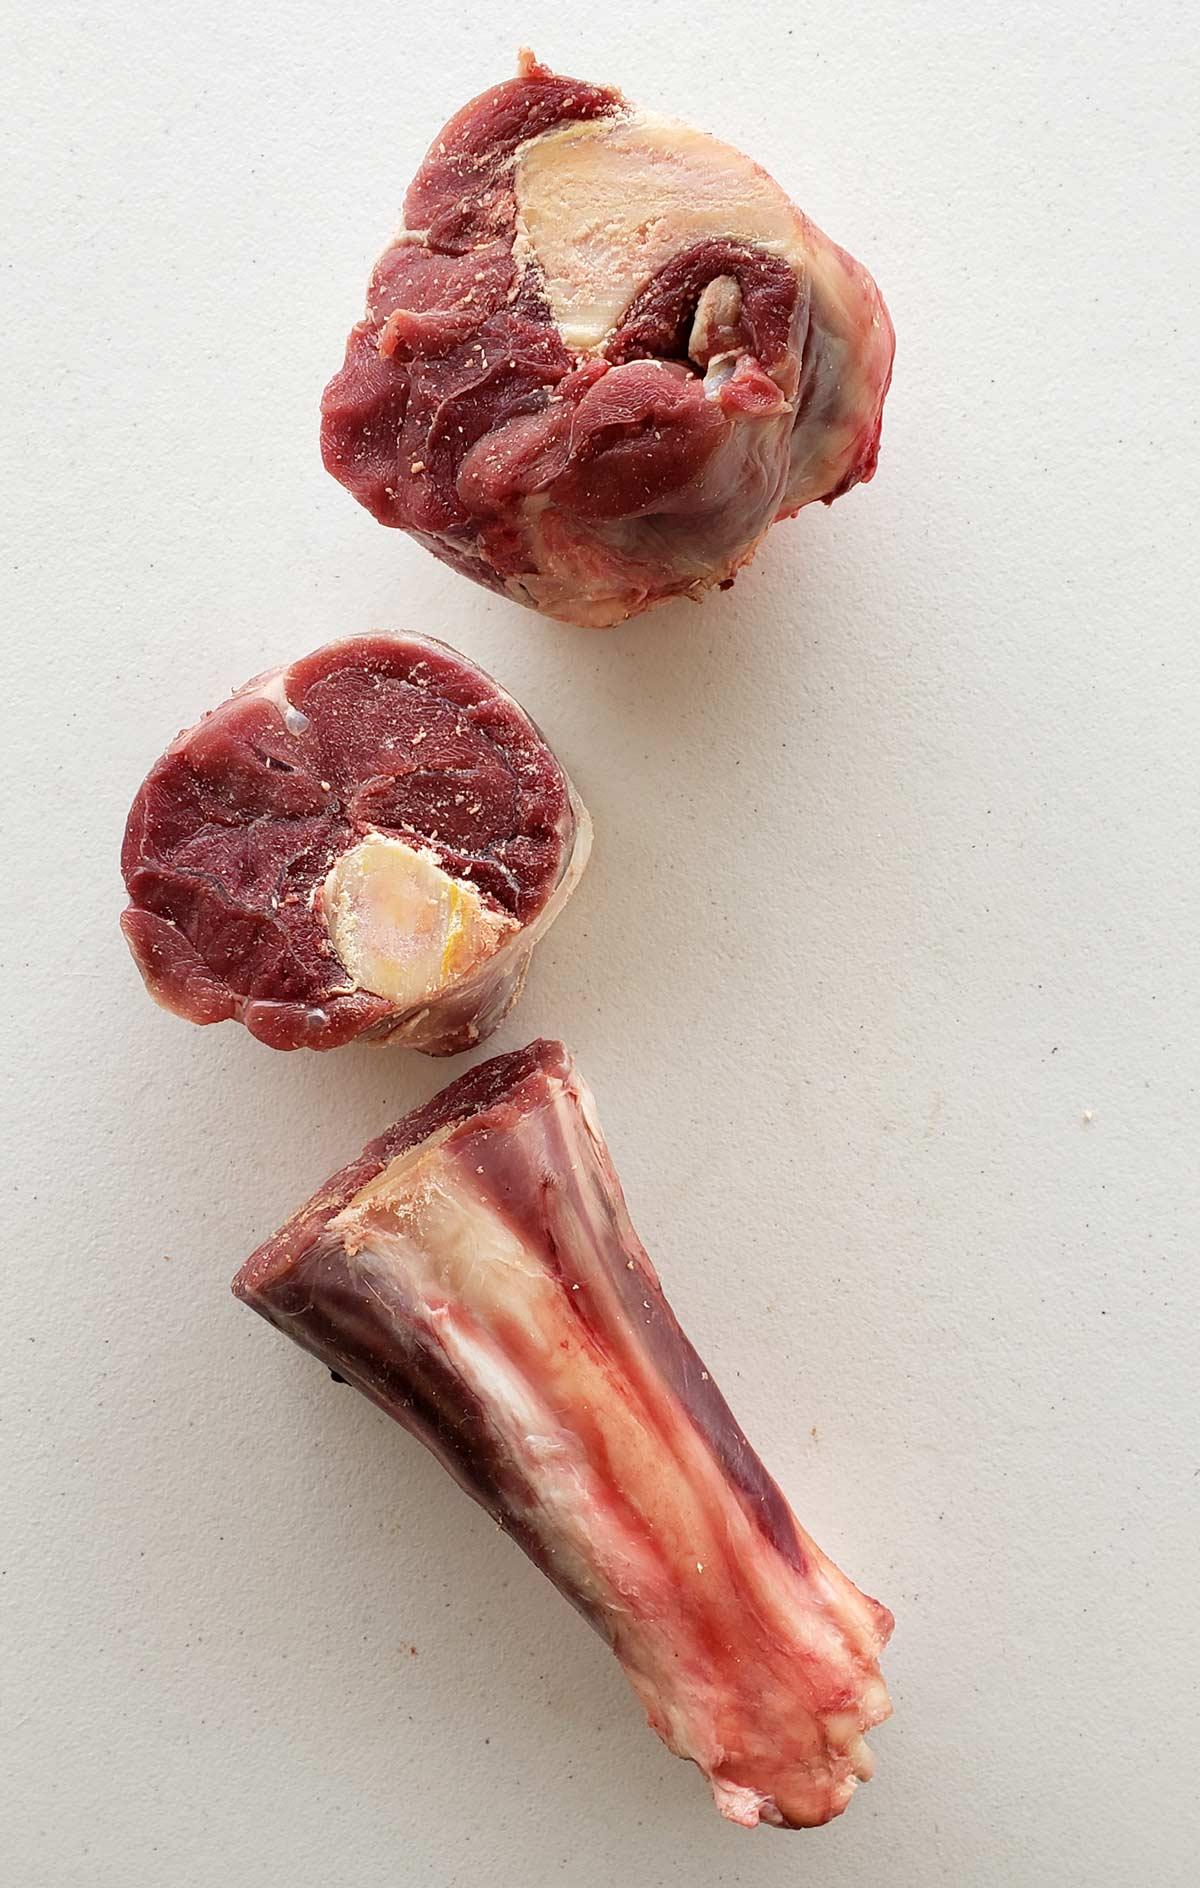 Nilgai shank sliced into ossobuco chunks